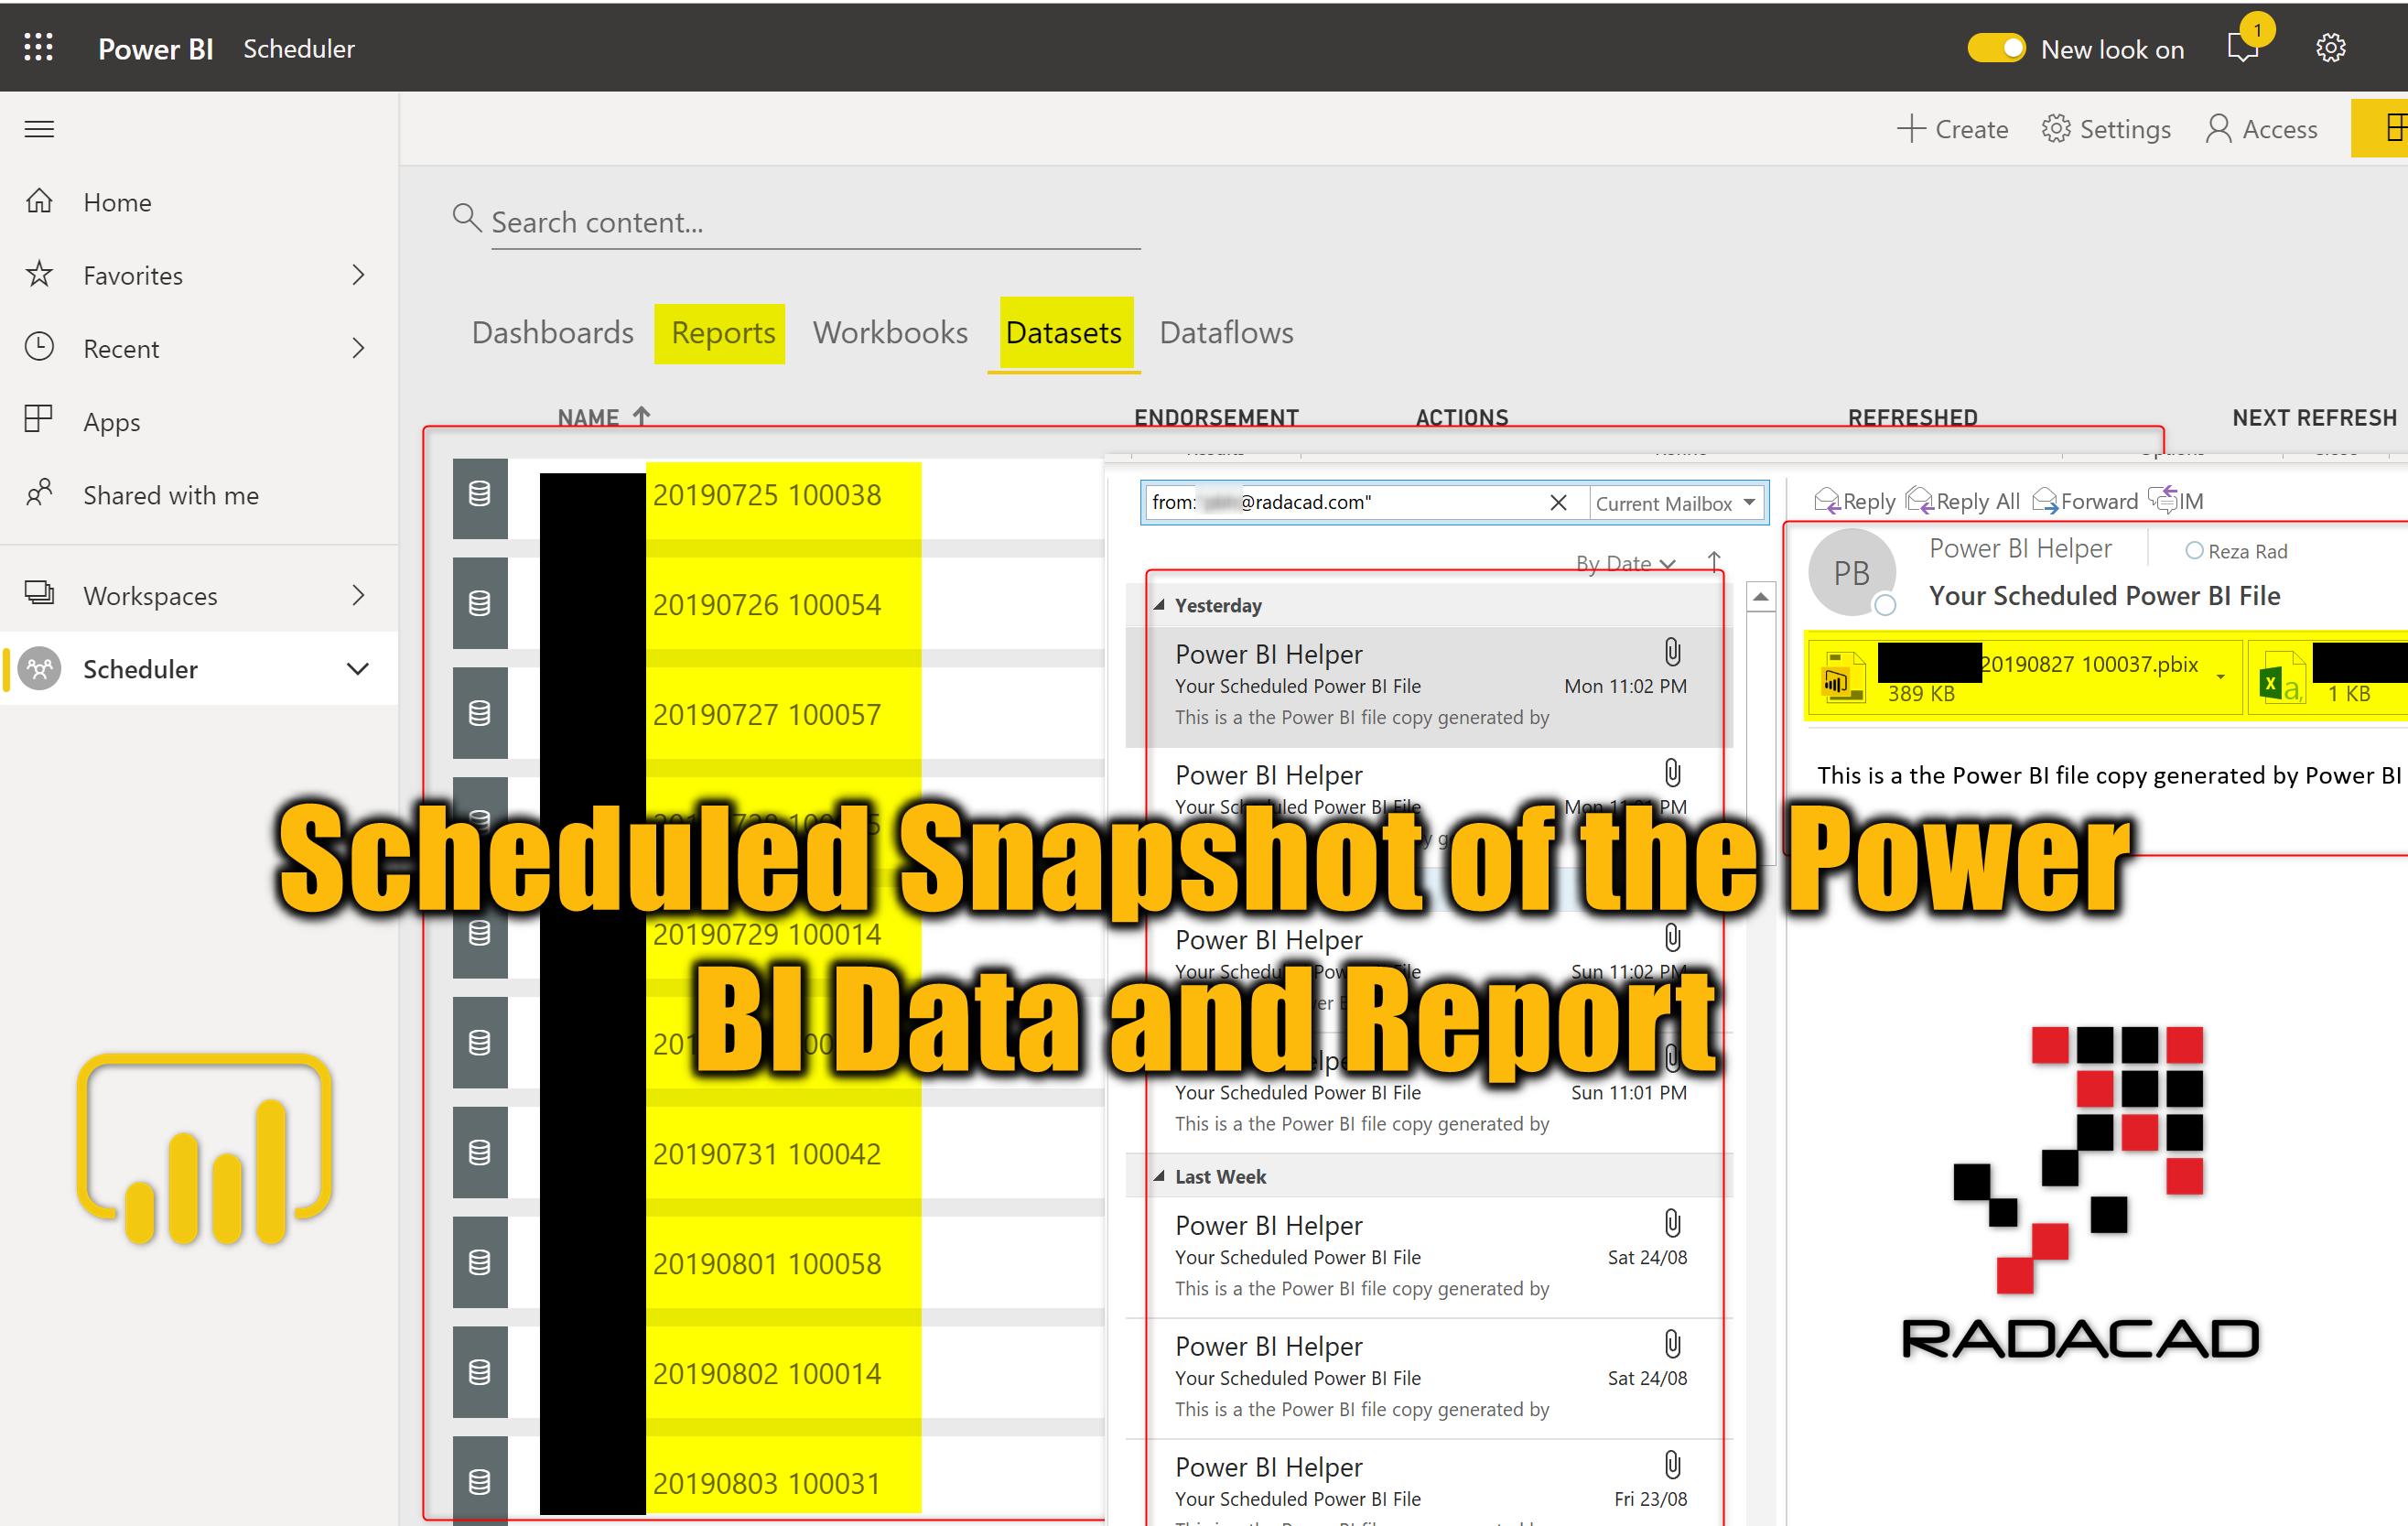 Scheduled Snapshot of the Power BI Data and Report